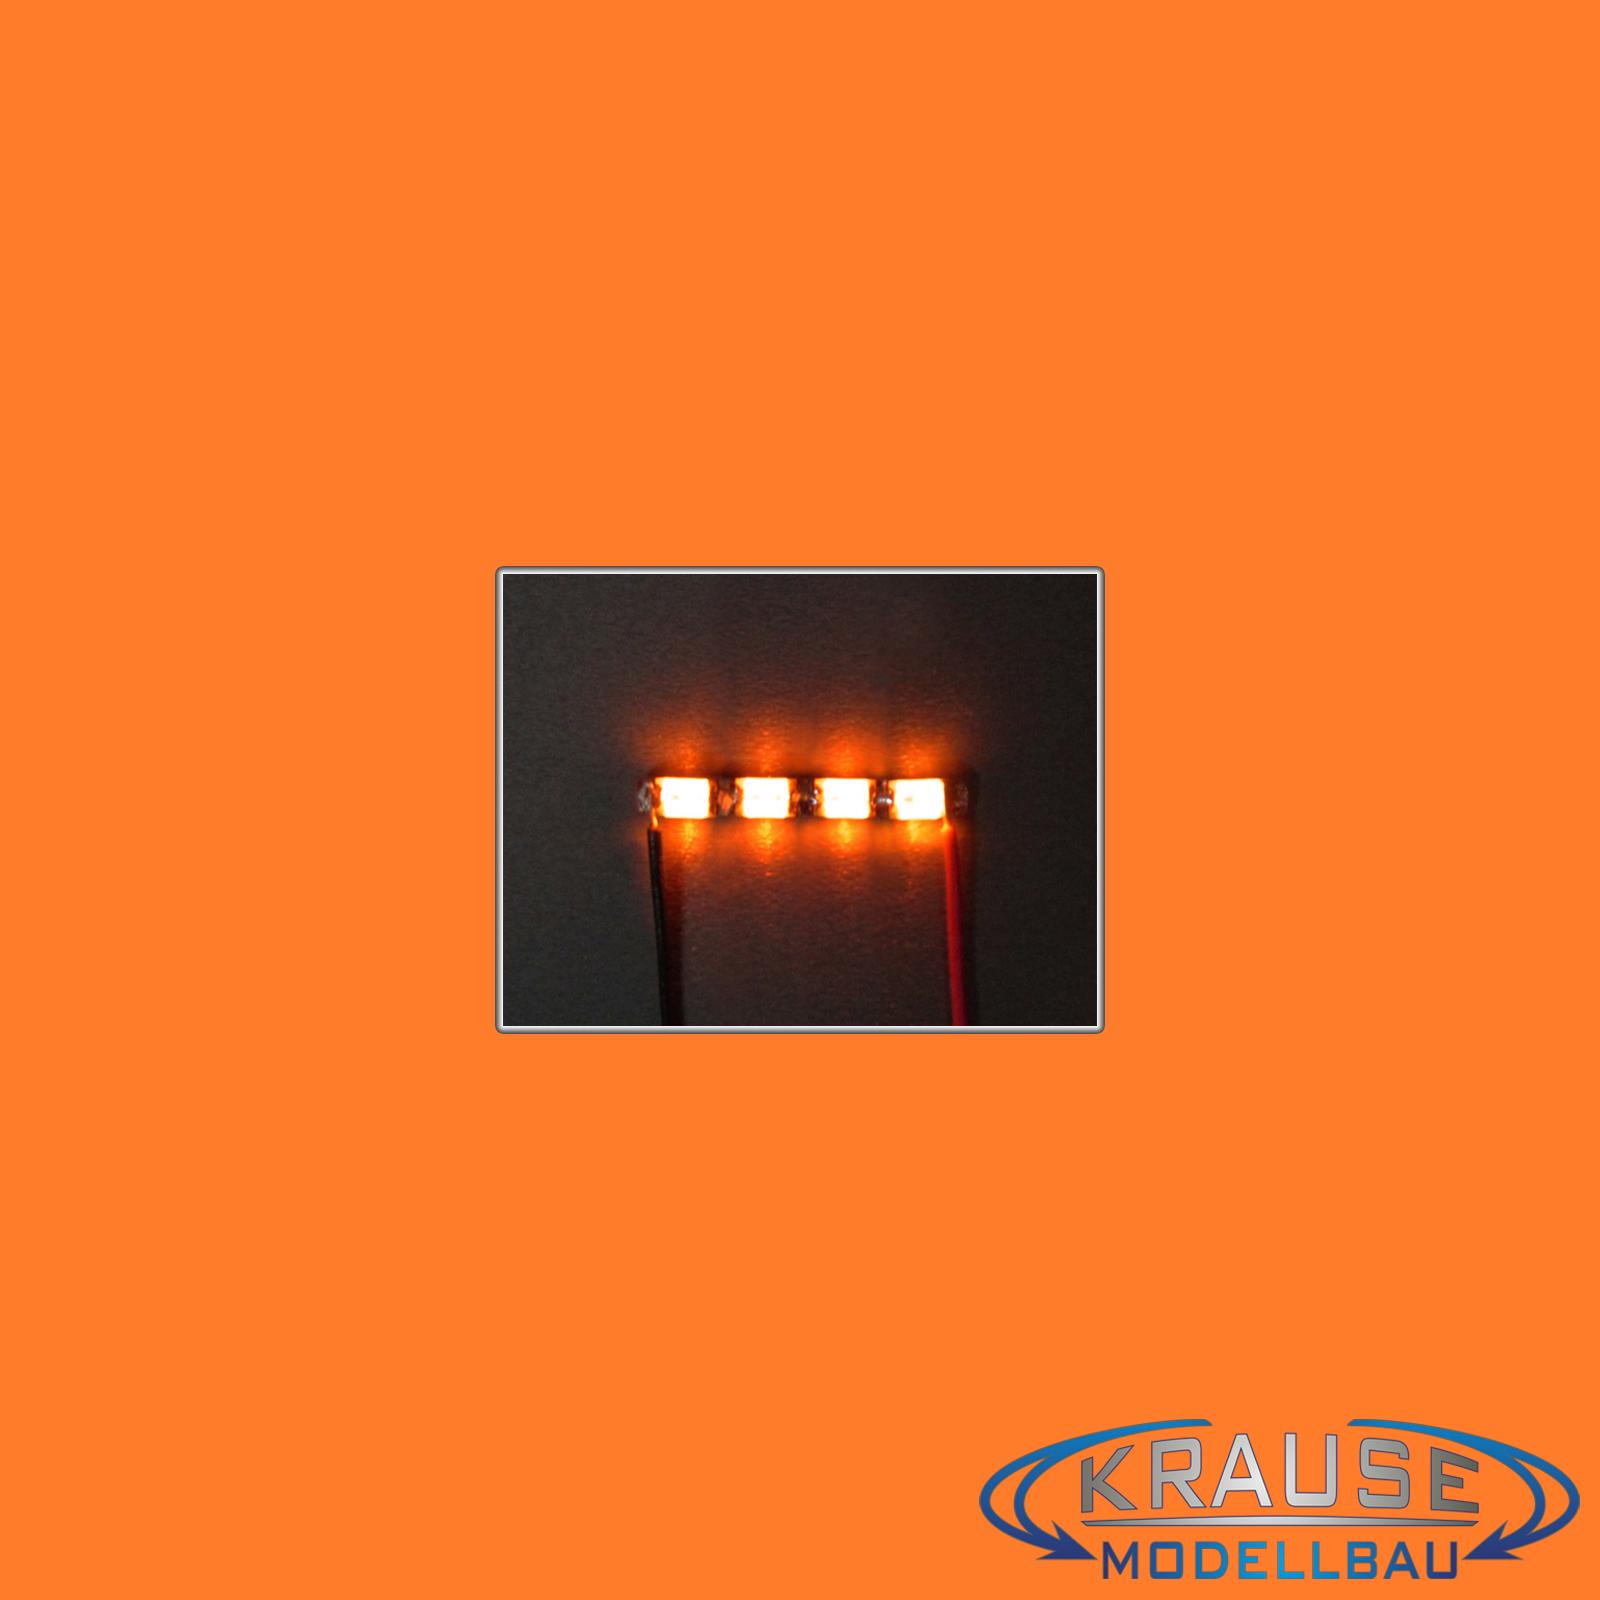 LEDBAR CLUSTER MICRO LED Typ 0805 mit 2 pinken LEDs Modellbahn Modellbau